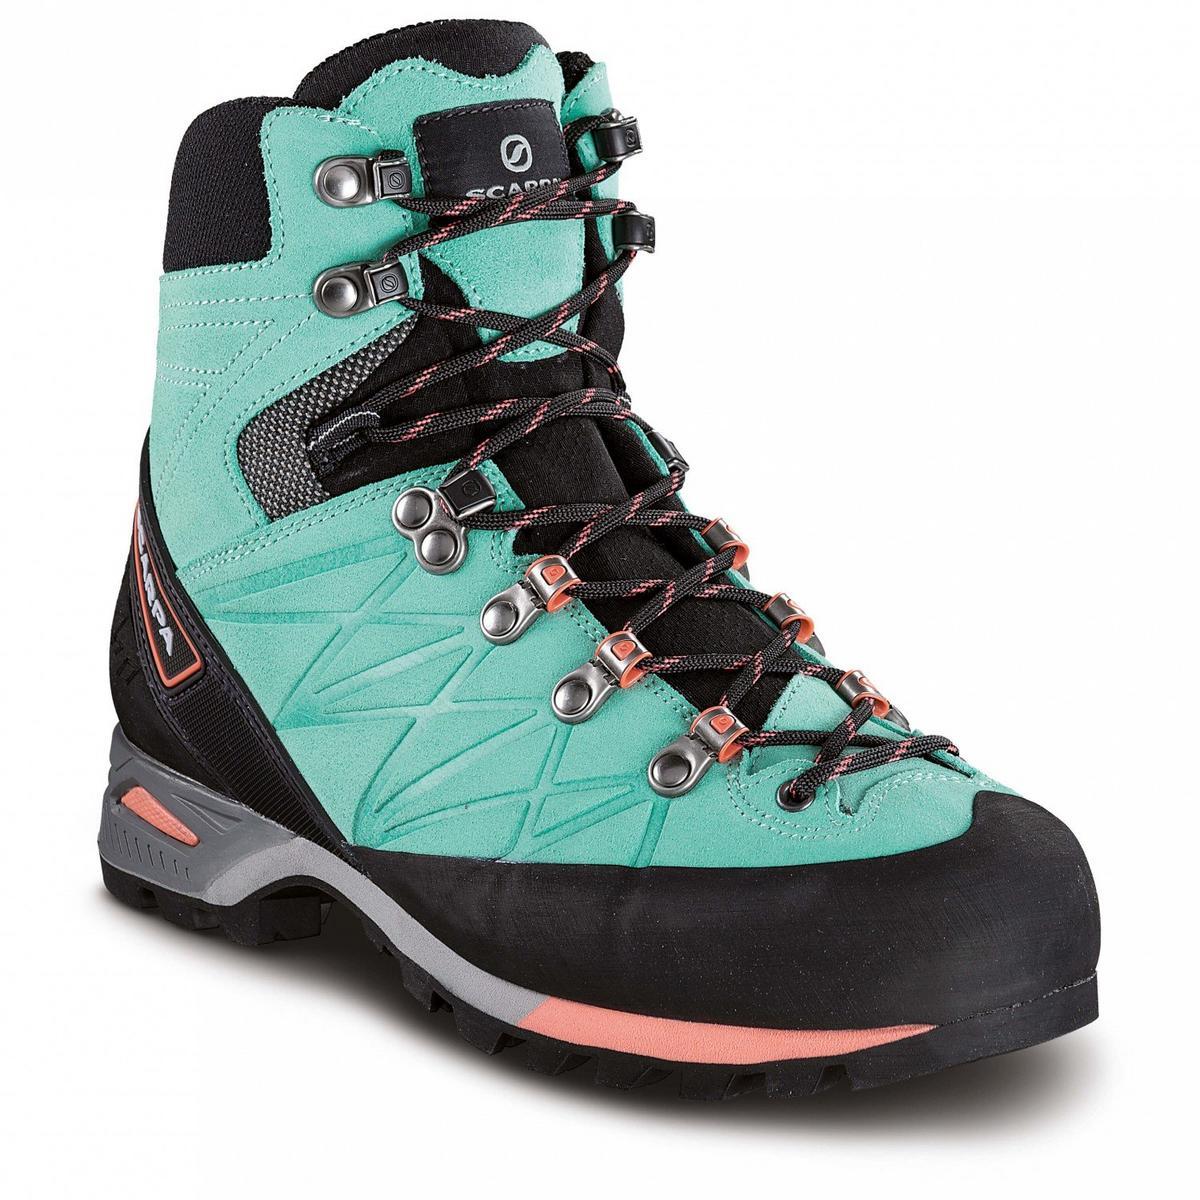 Scarpa Women's Marmolada Pro OD Boot